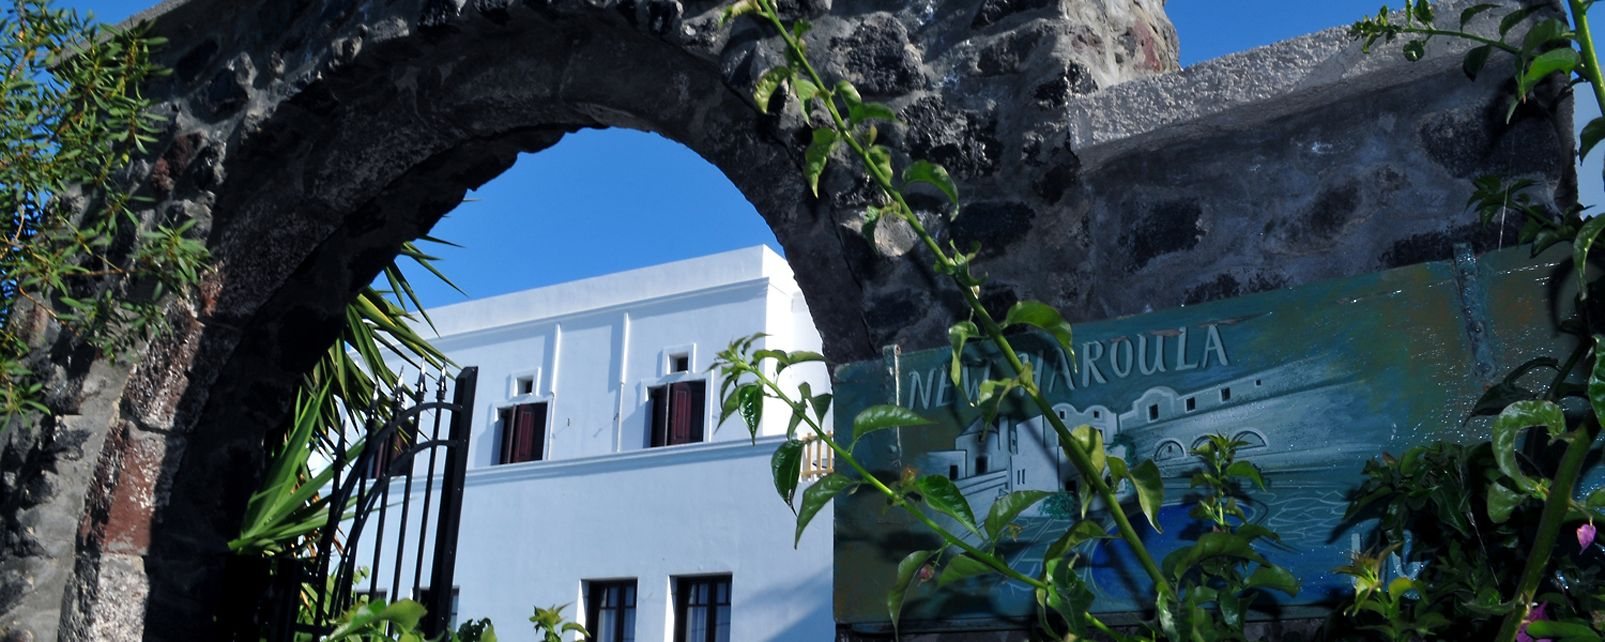 Hotel New Haroula  Fira